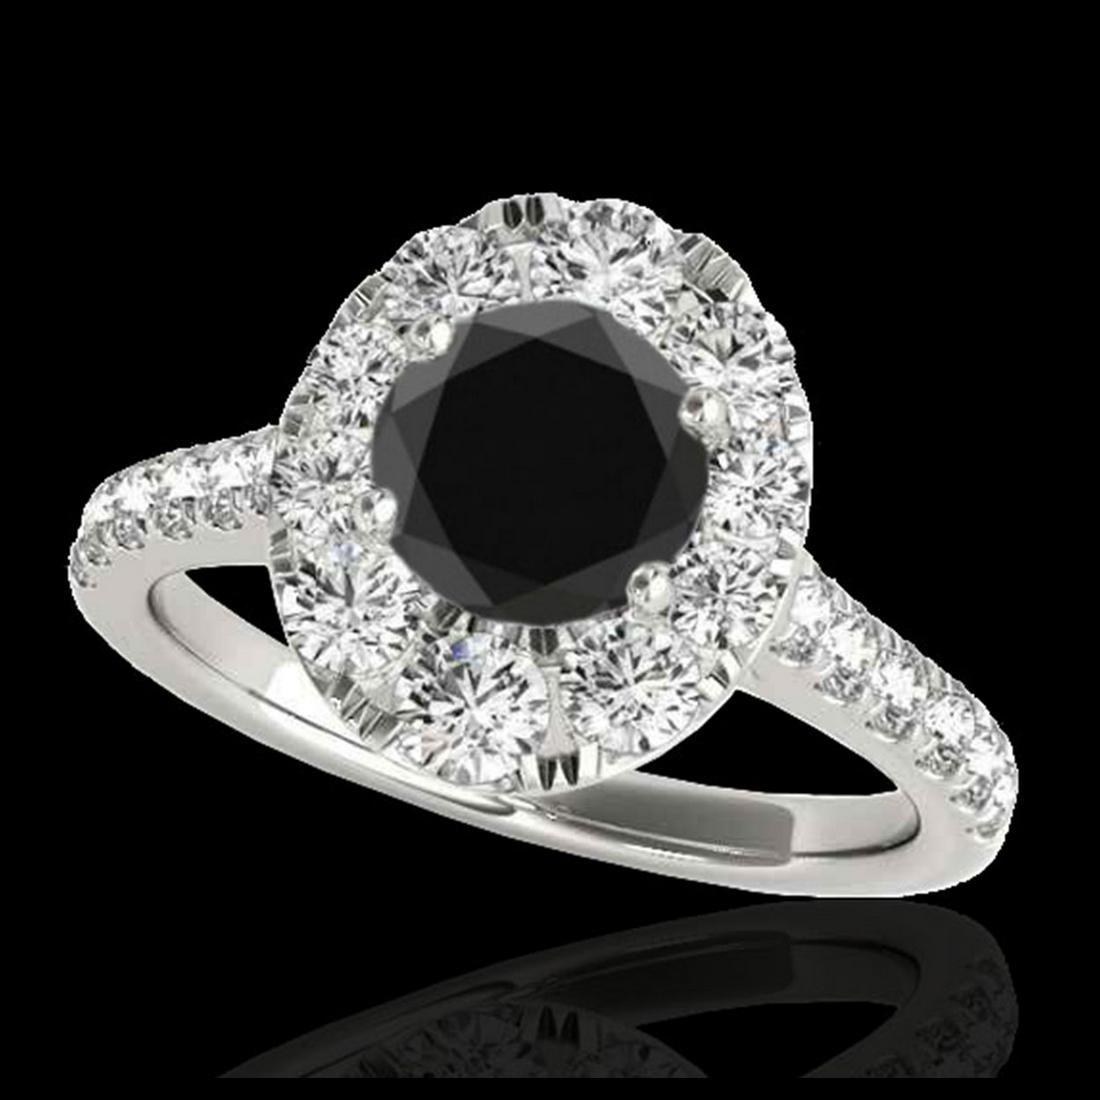 2 ctw VS Black Diamond Solitaire Halo Ring 10K White